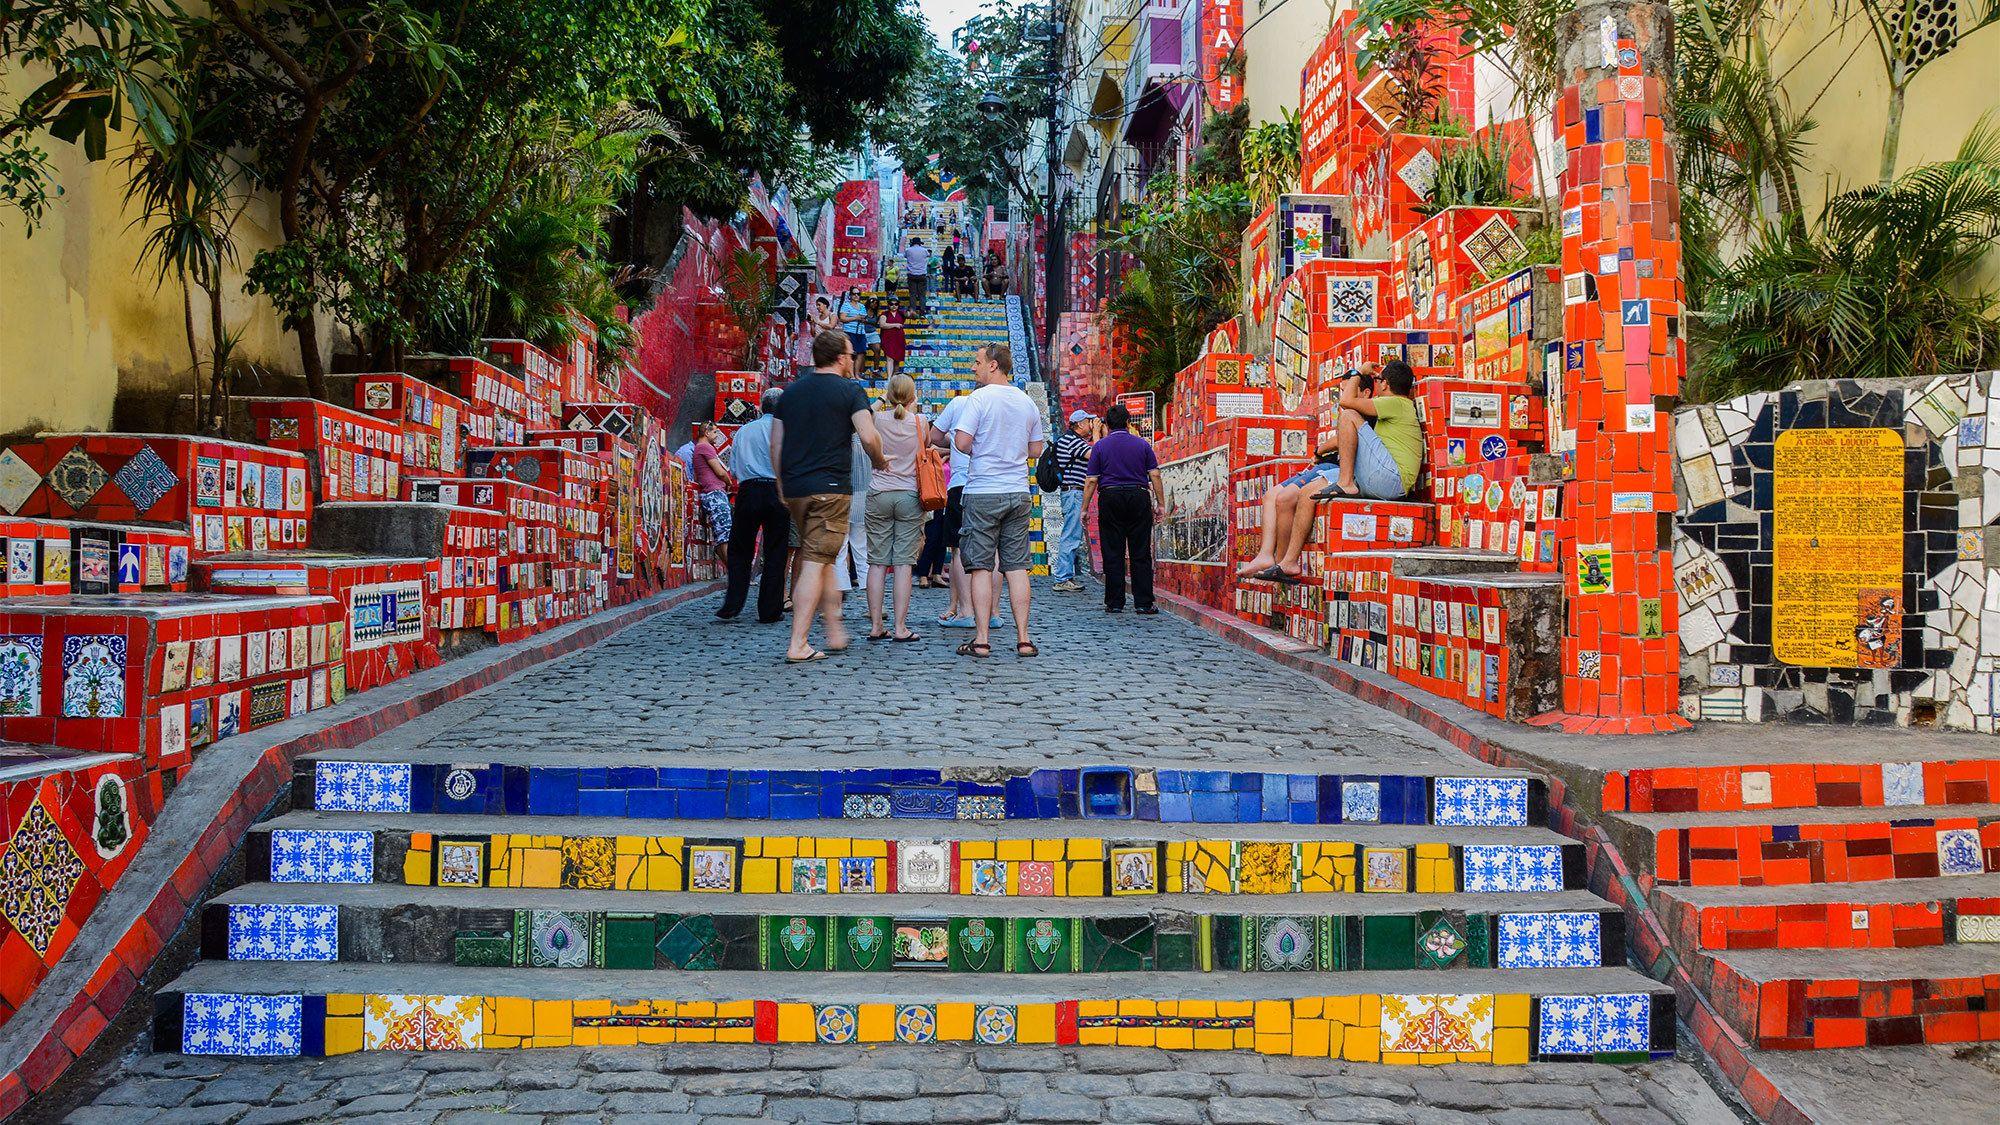 Vibrant steps in Rio de Janeiro